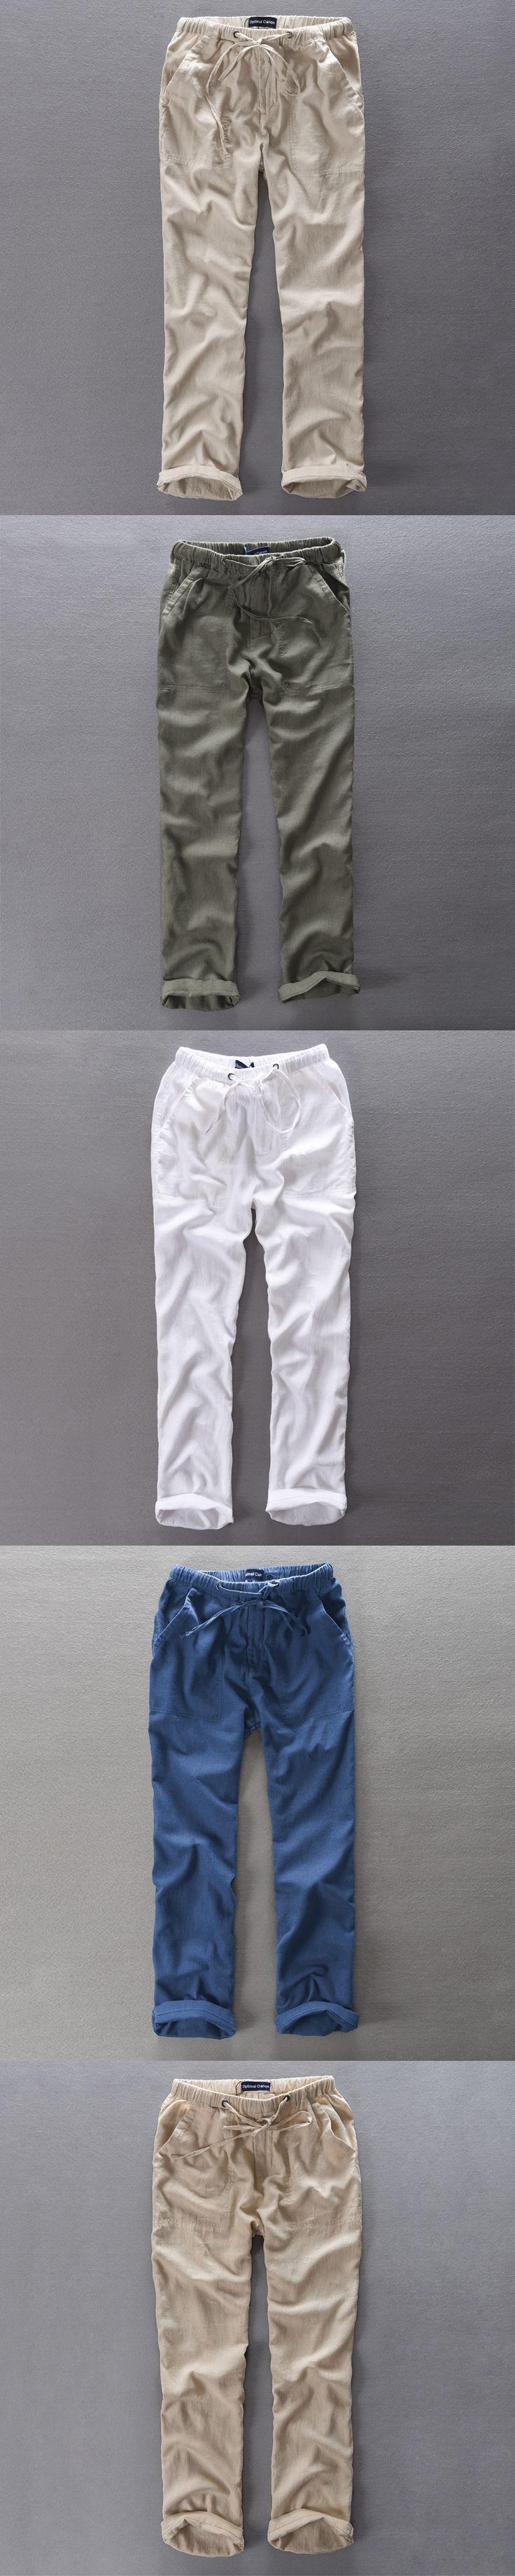 Men's Summer Casual Pants Natural Cotton Linen Trousers White Linen Elastic Waist Straight Joggers Pants Y234